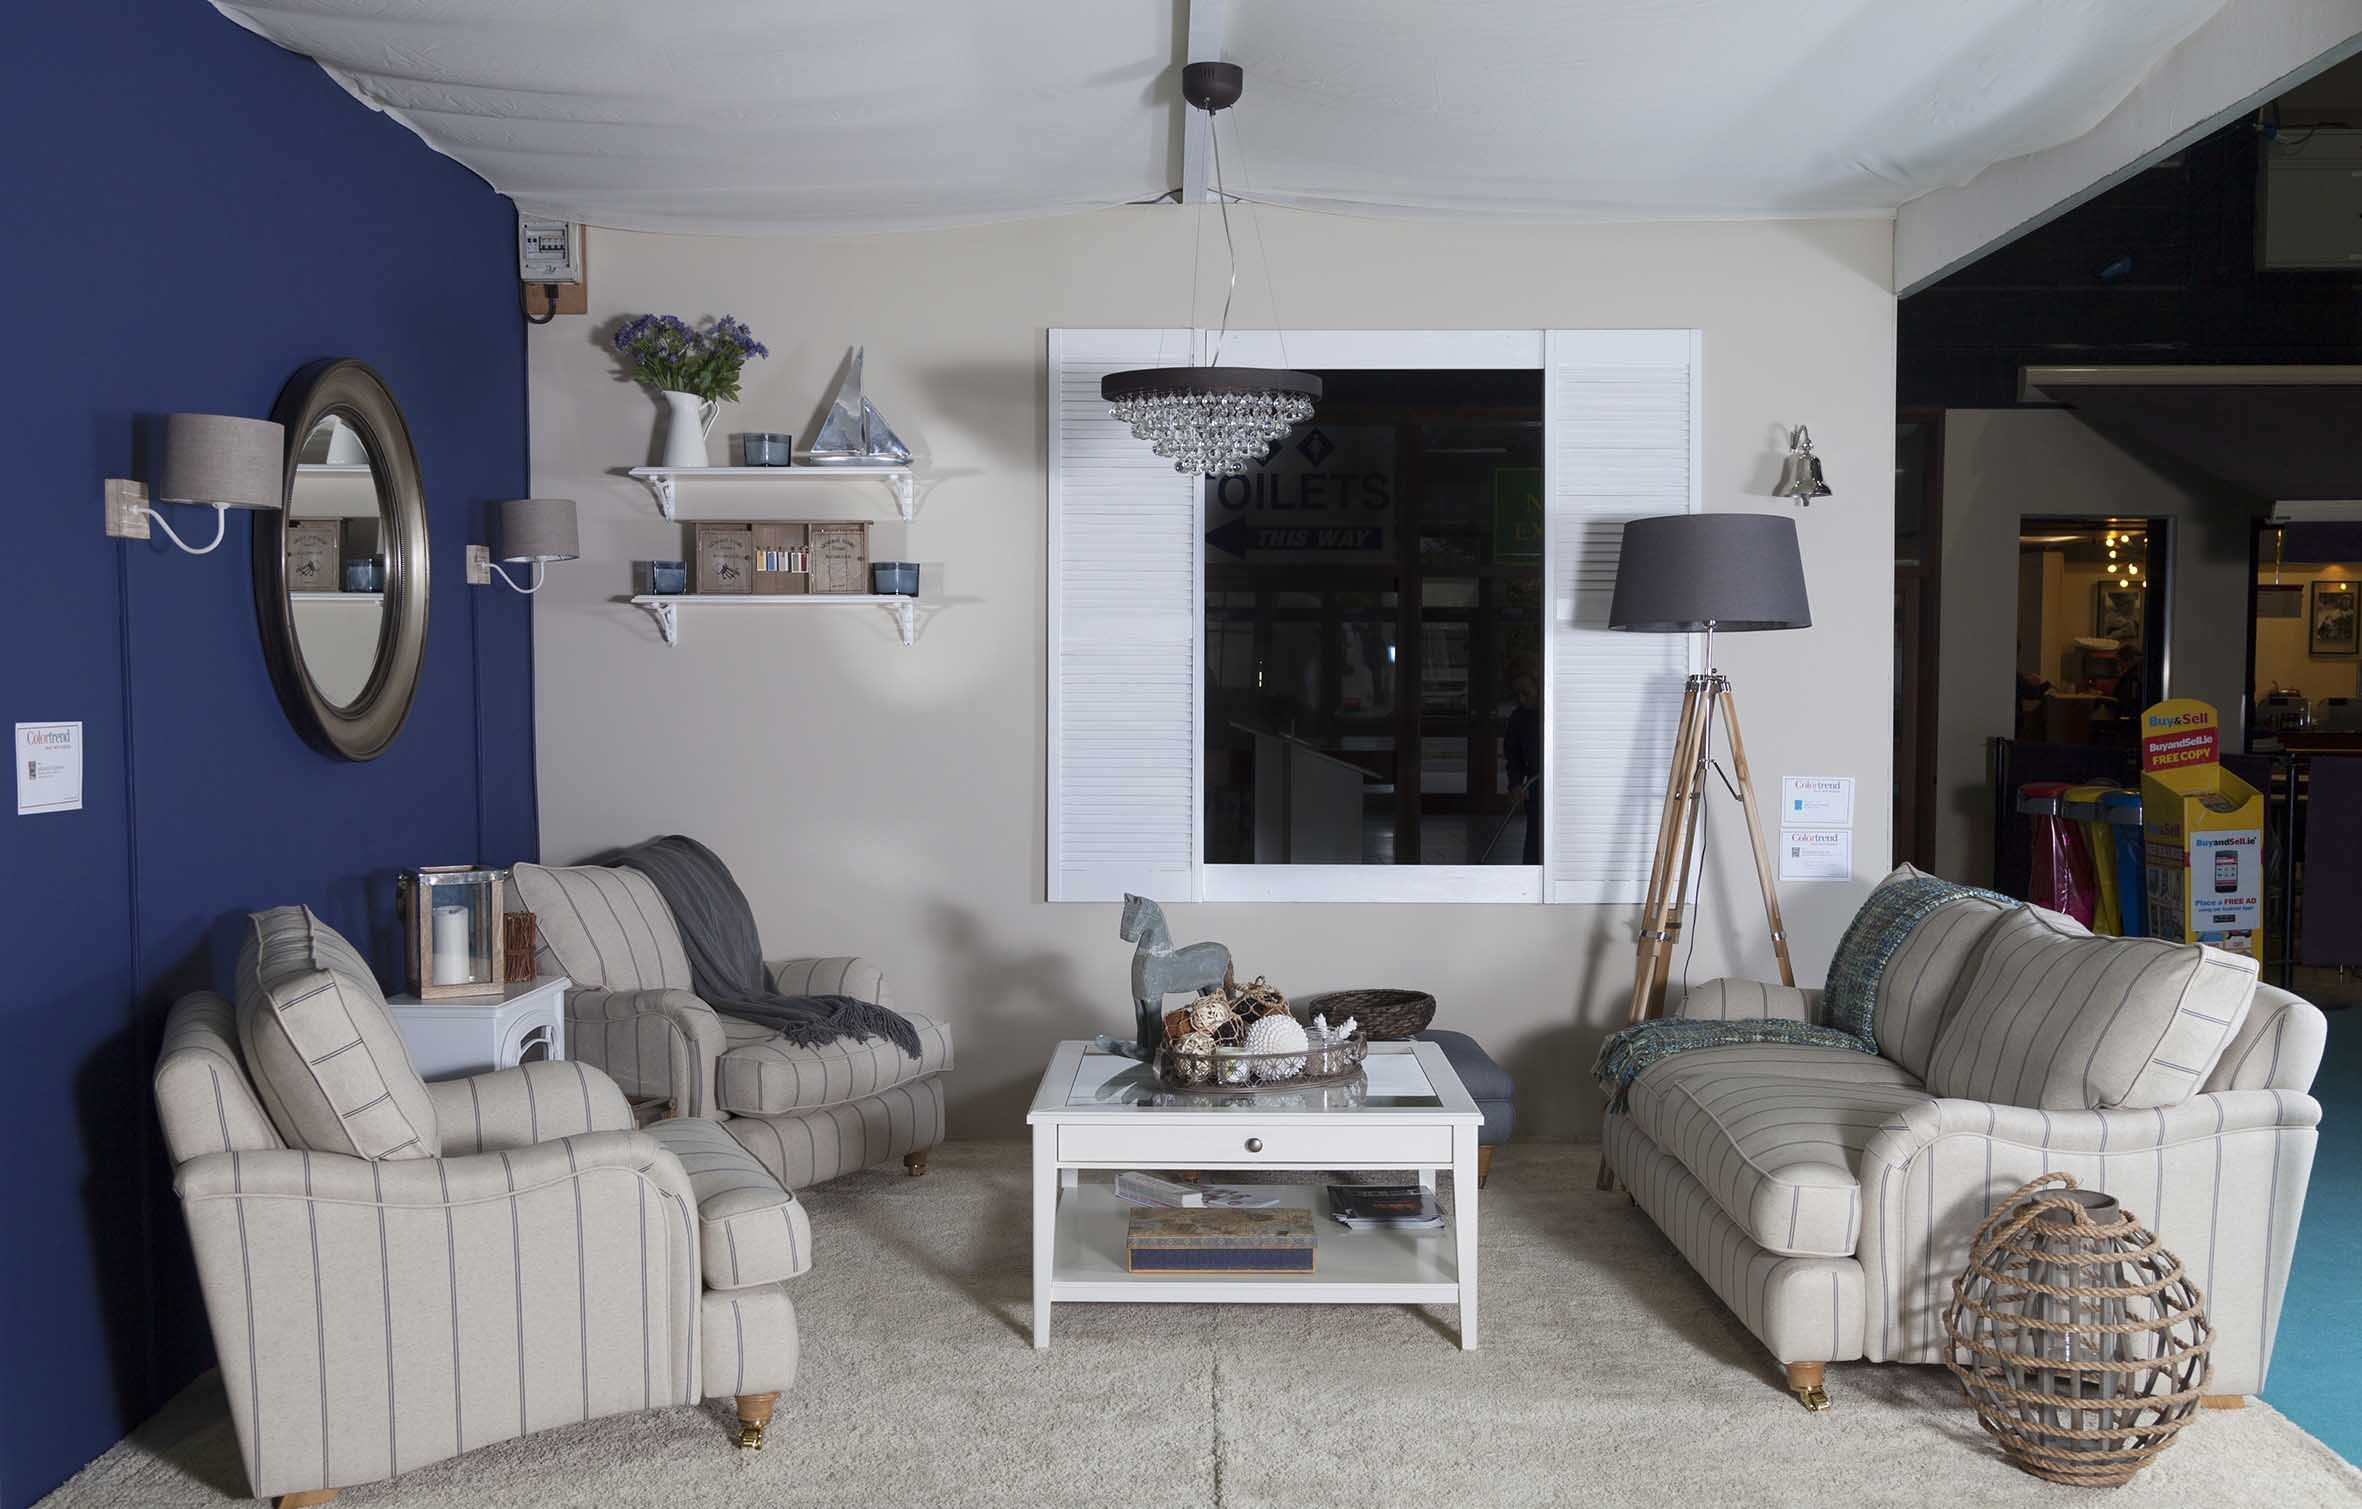 Woodwork Design For Living Room Hepburn Design Living Room Walls Midnight Dream Colortrend